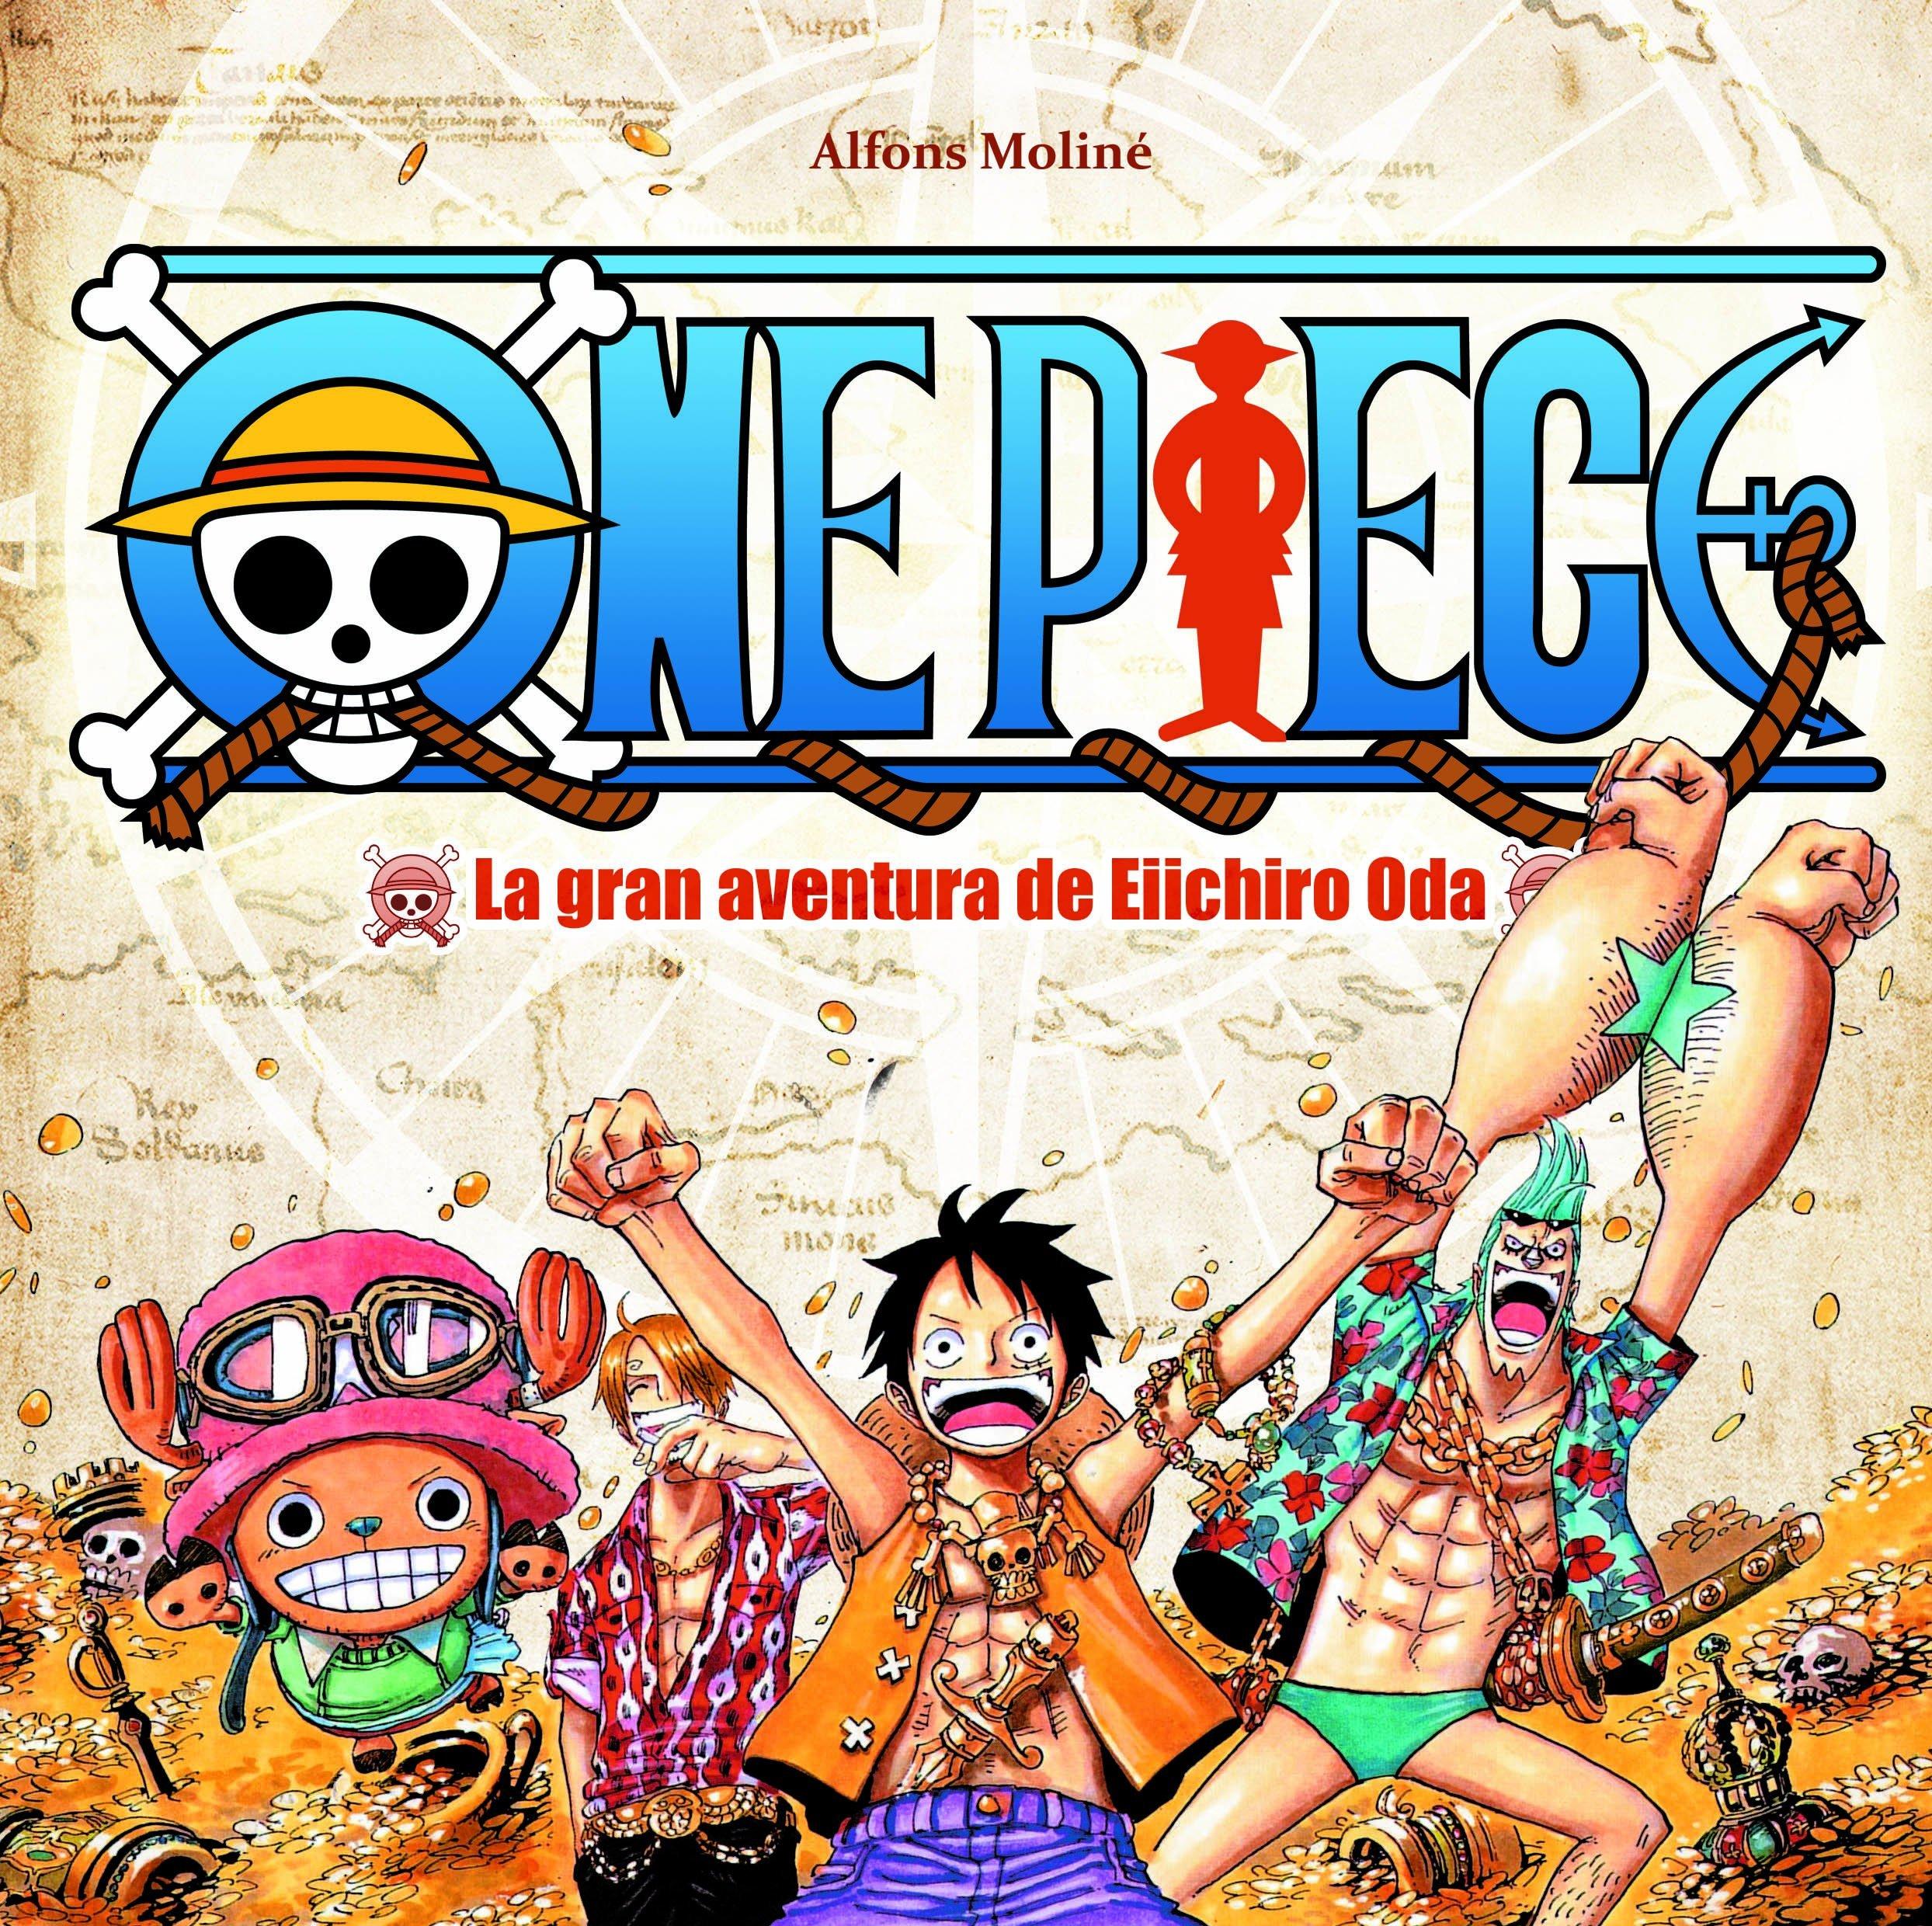 One Piece: La gran aventura de Eiichiro Oda Manga tebeos Dolmen: Amazon.es: Moline, Alfons: Libros